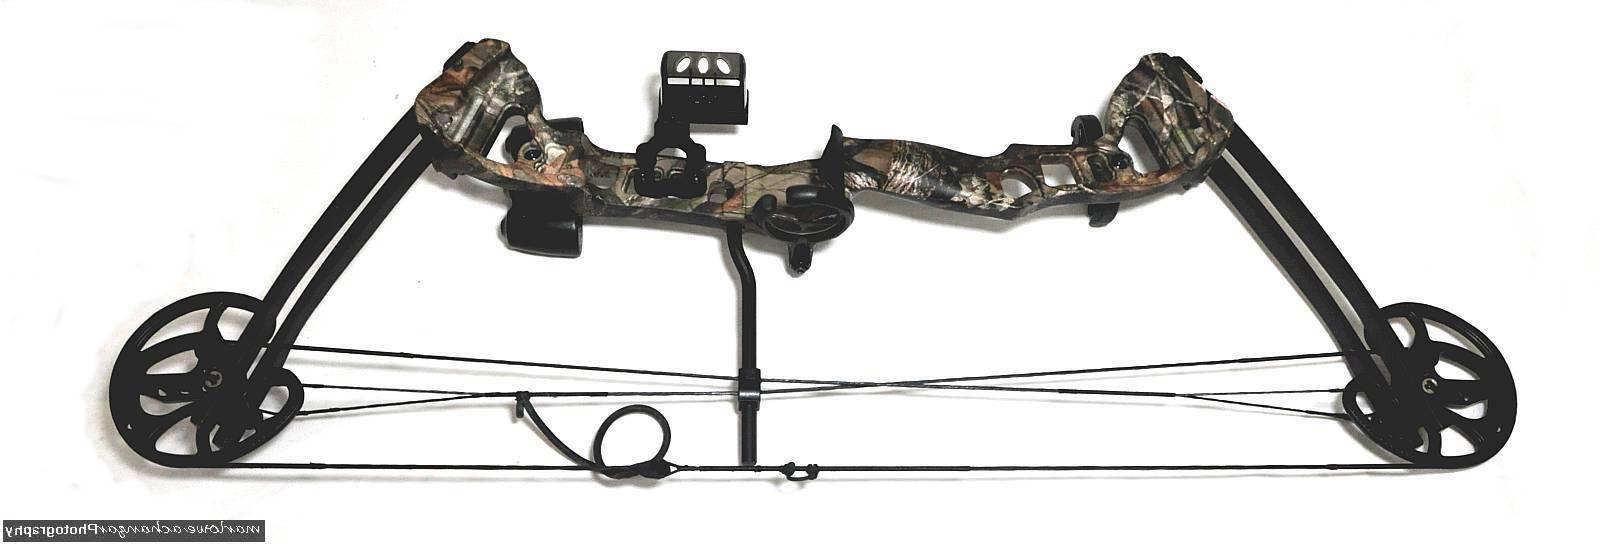 vortex compound bow by 45lbs black cam